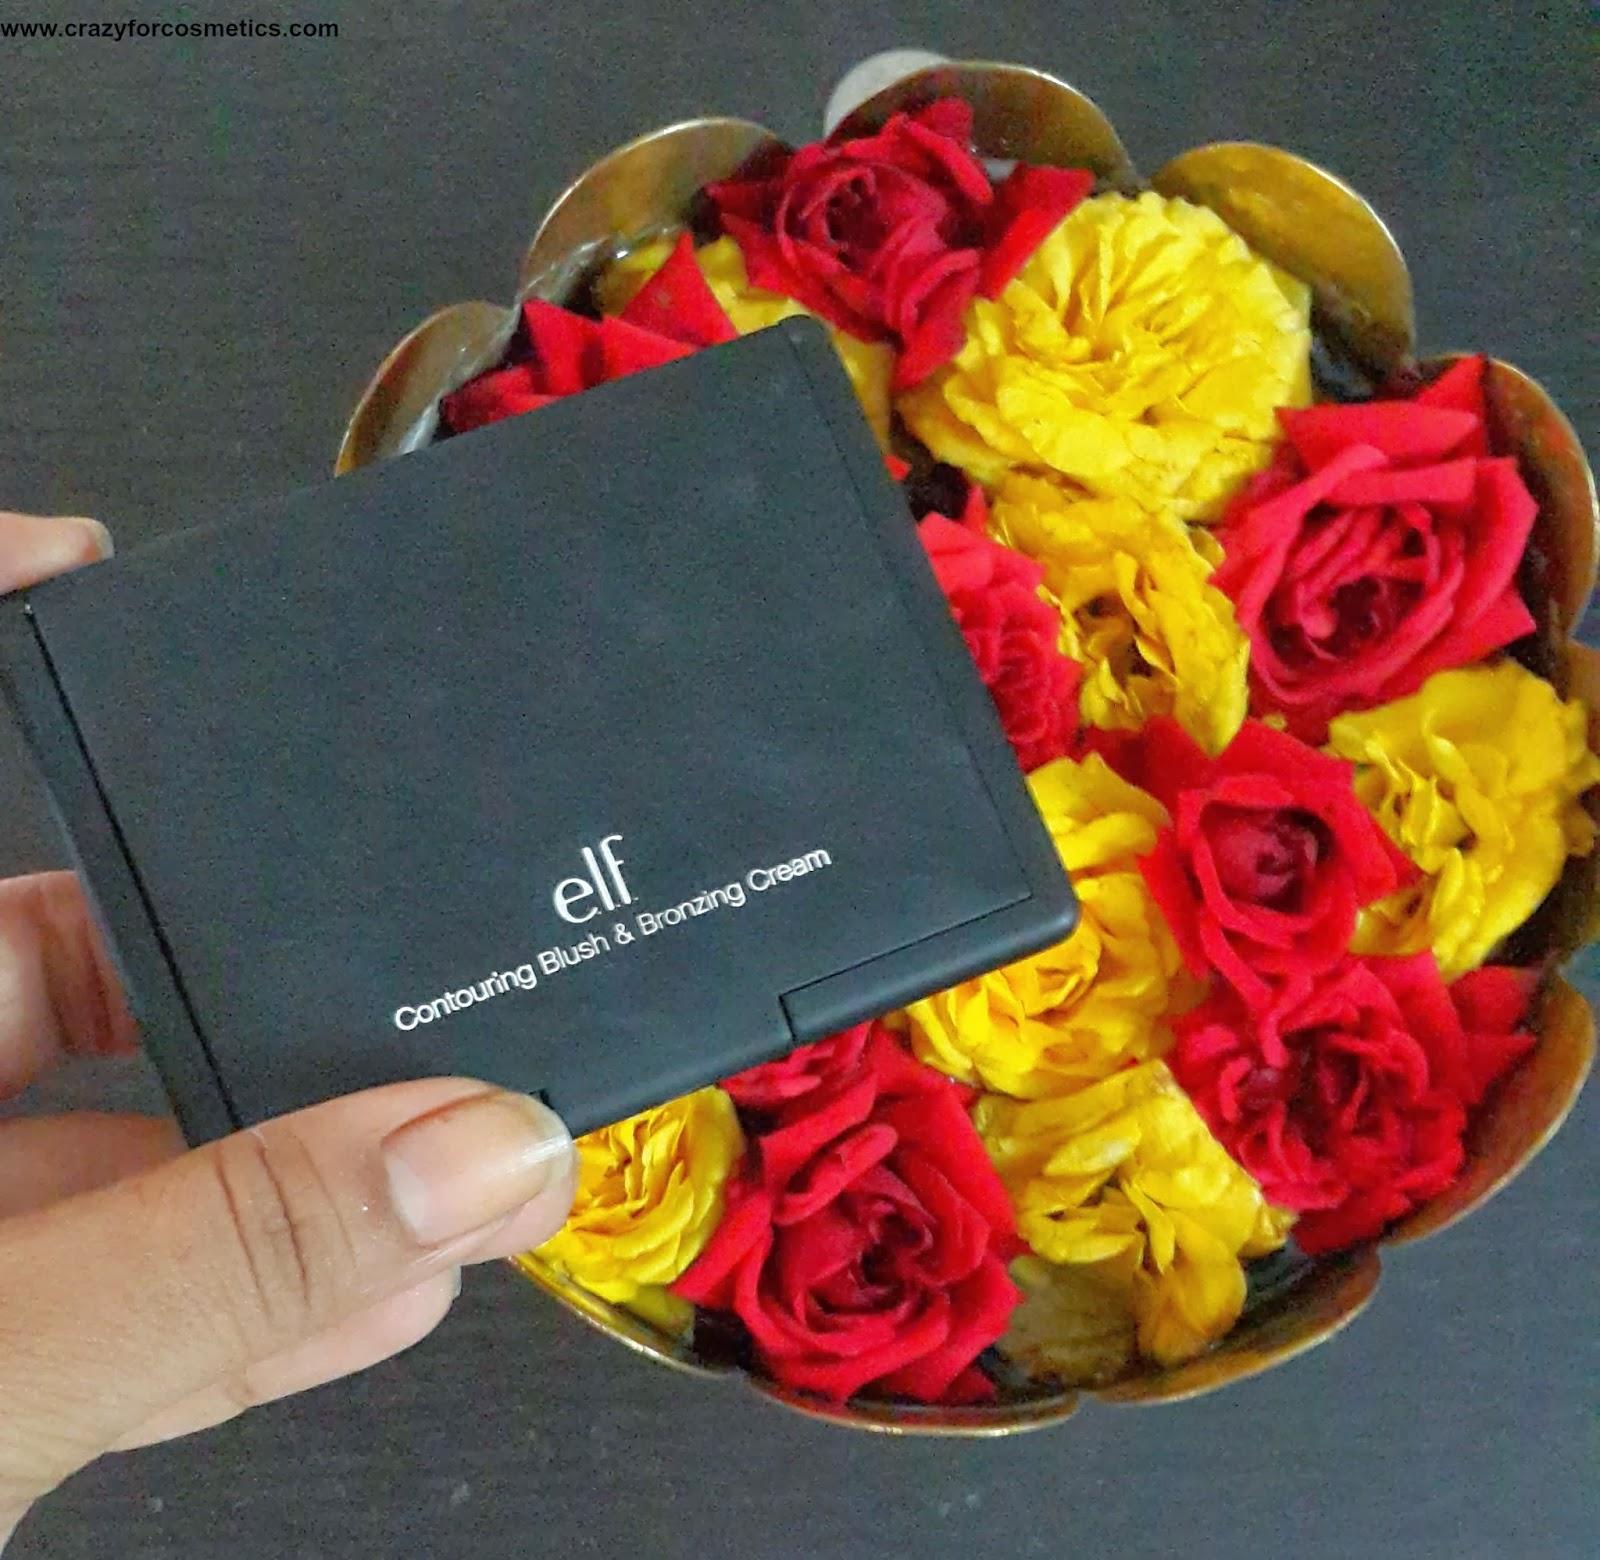 ELF Contouring & Blush Kit review packaging Price